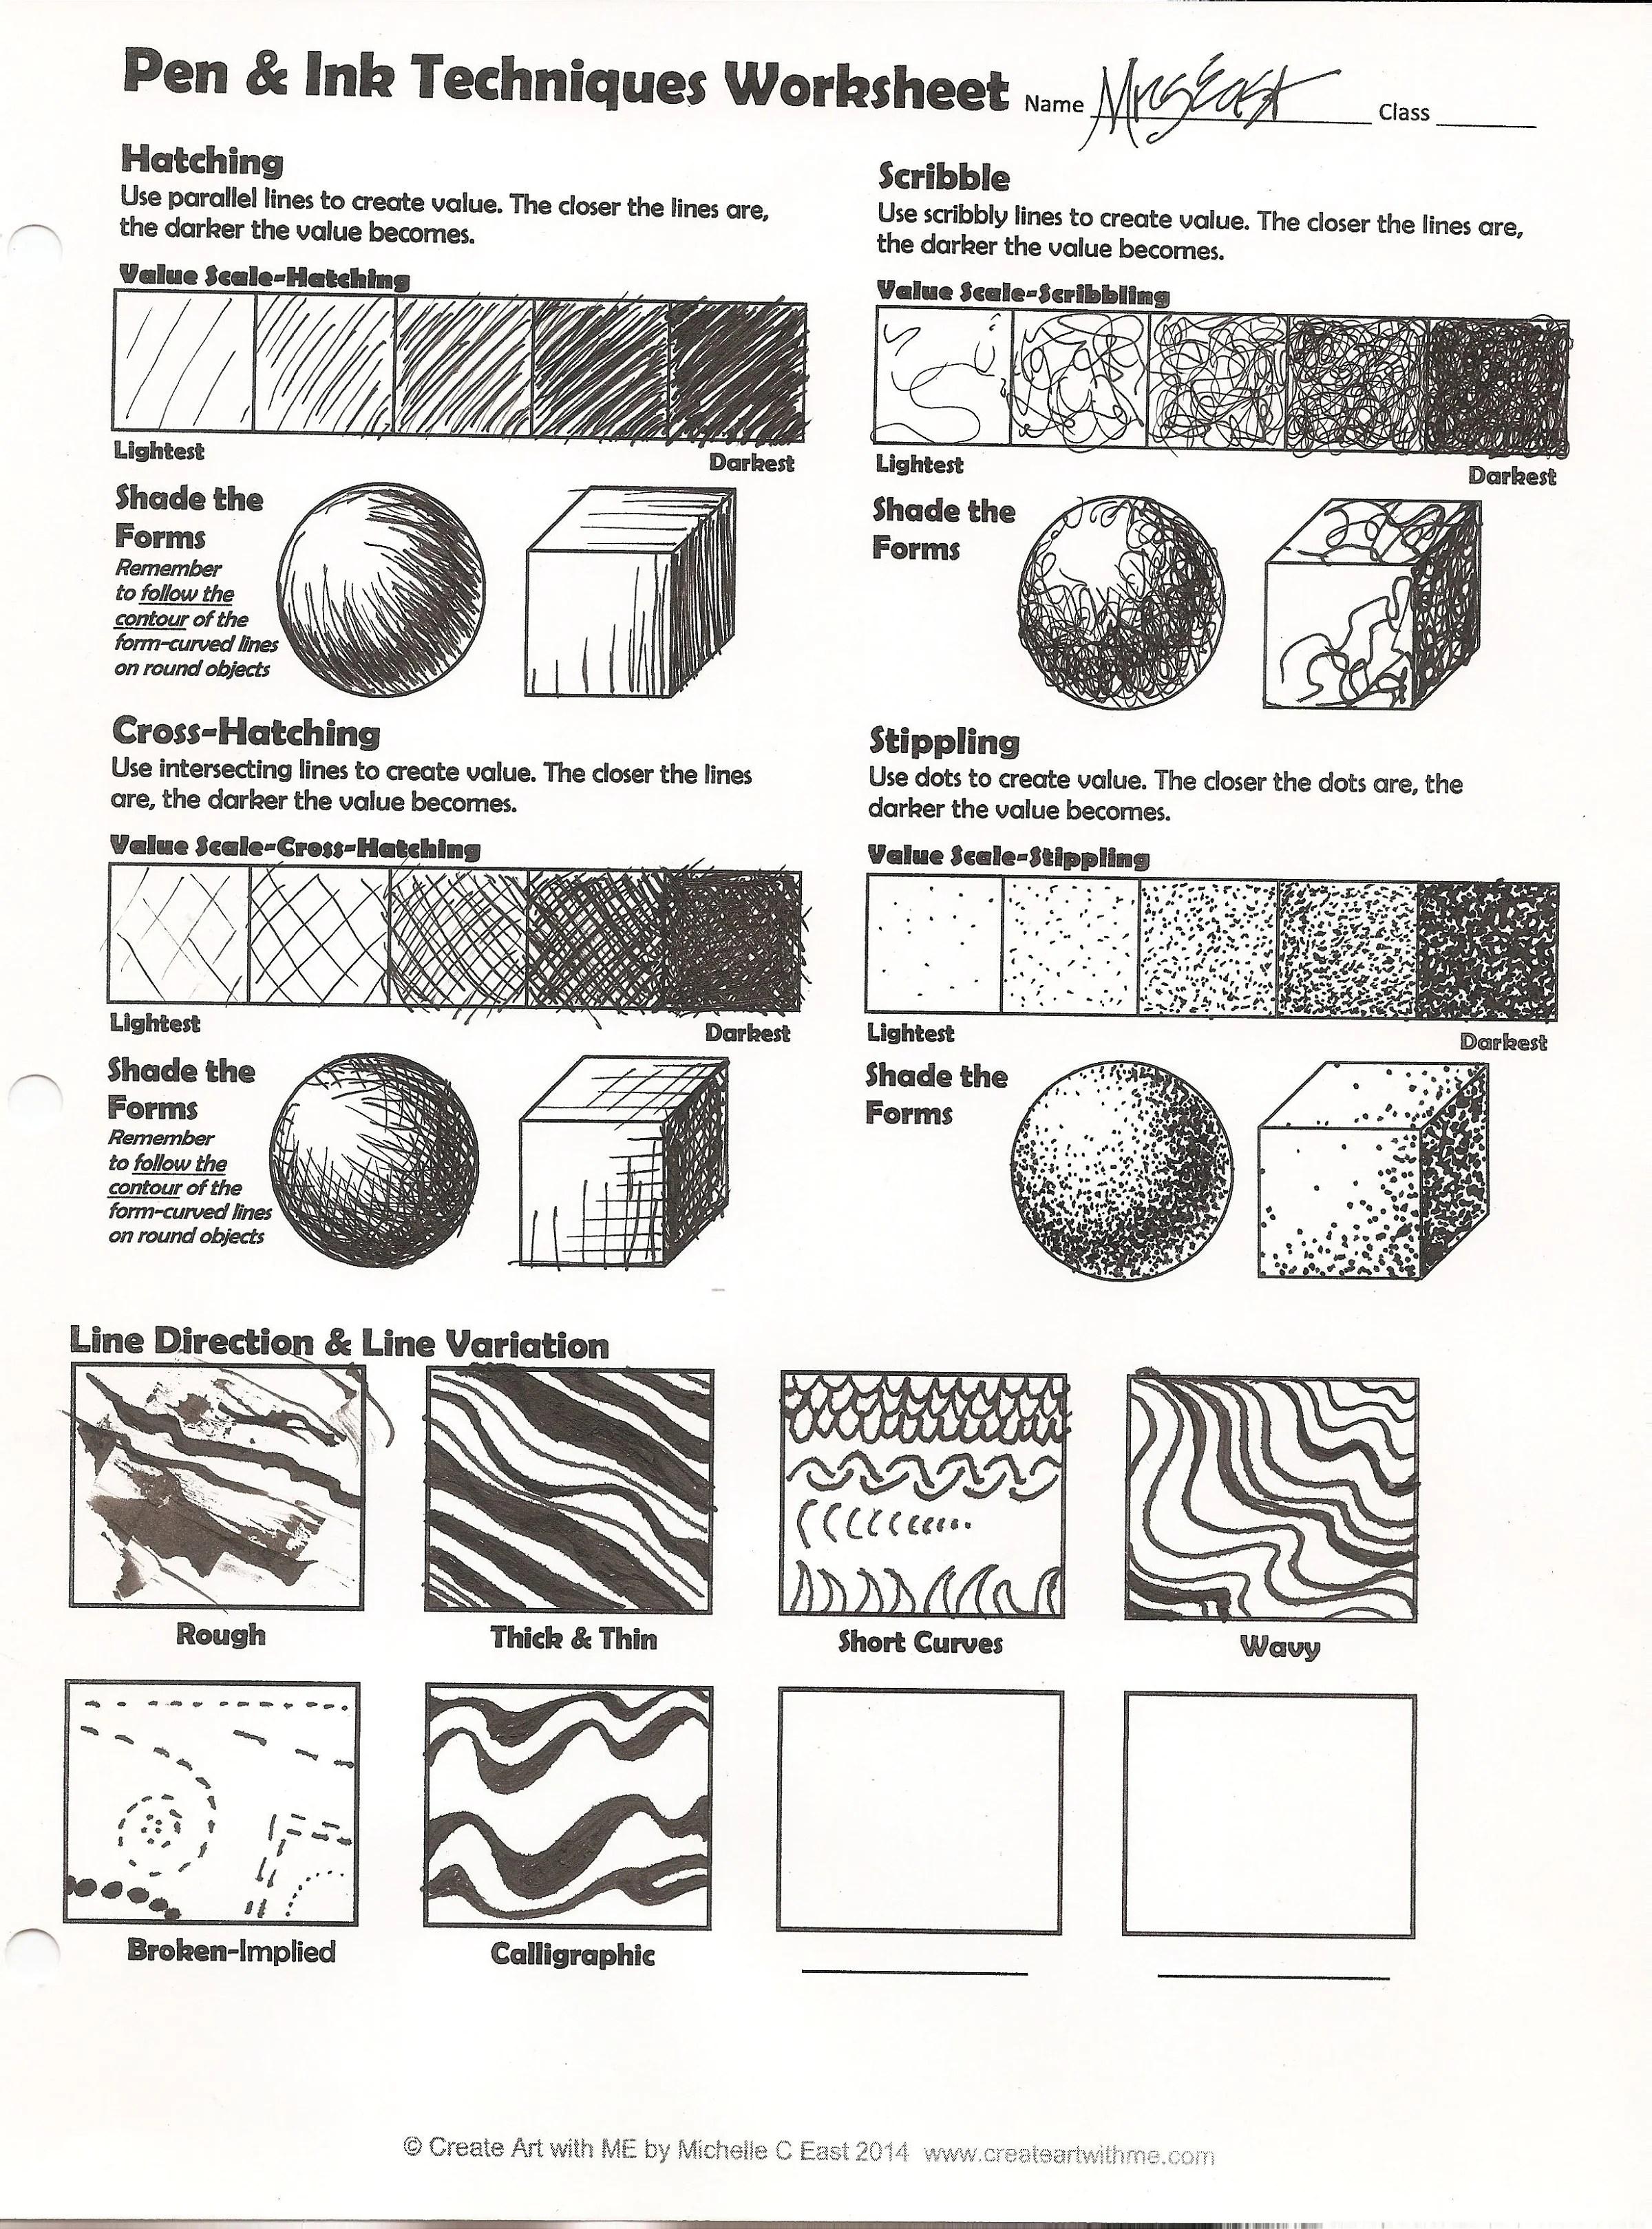 Scribble Drawing Lesson Plan : Pen ink techniques lesson plan worksheet create art